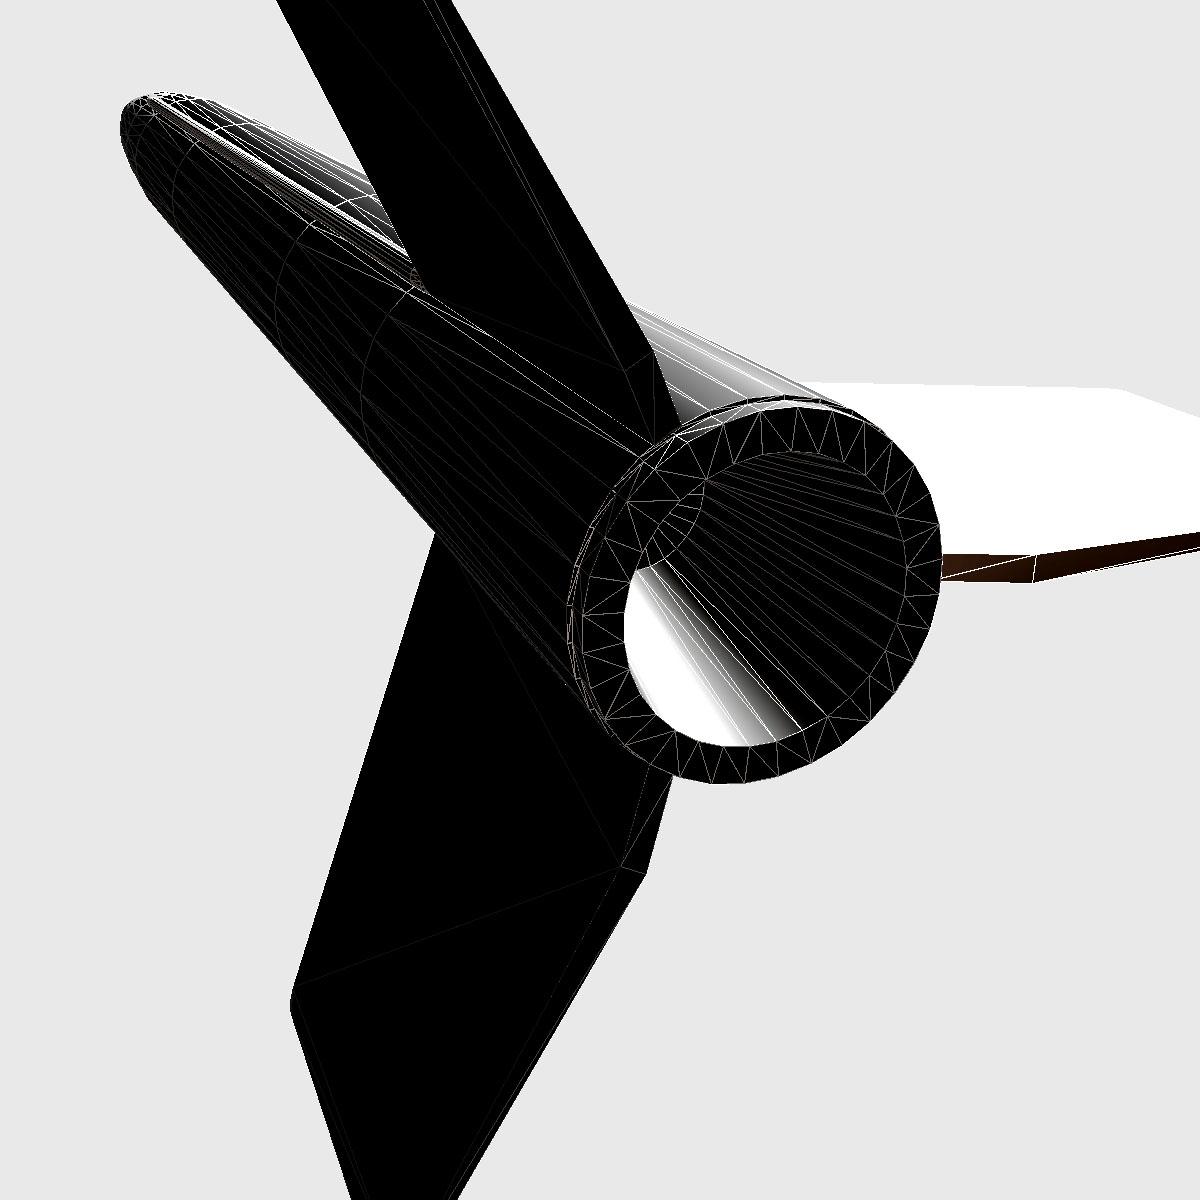 nasa aerobee 100 rocket 3d model 3ds dxf fbx blend cob dae x  obj 158447